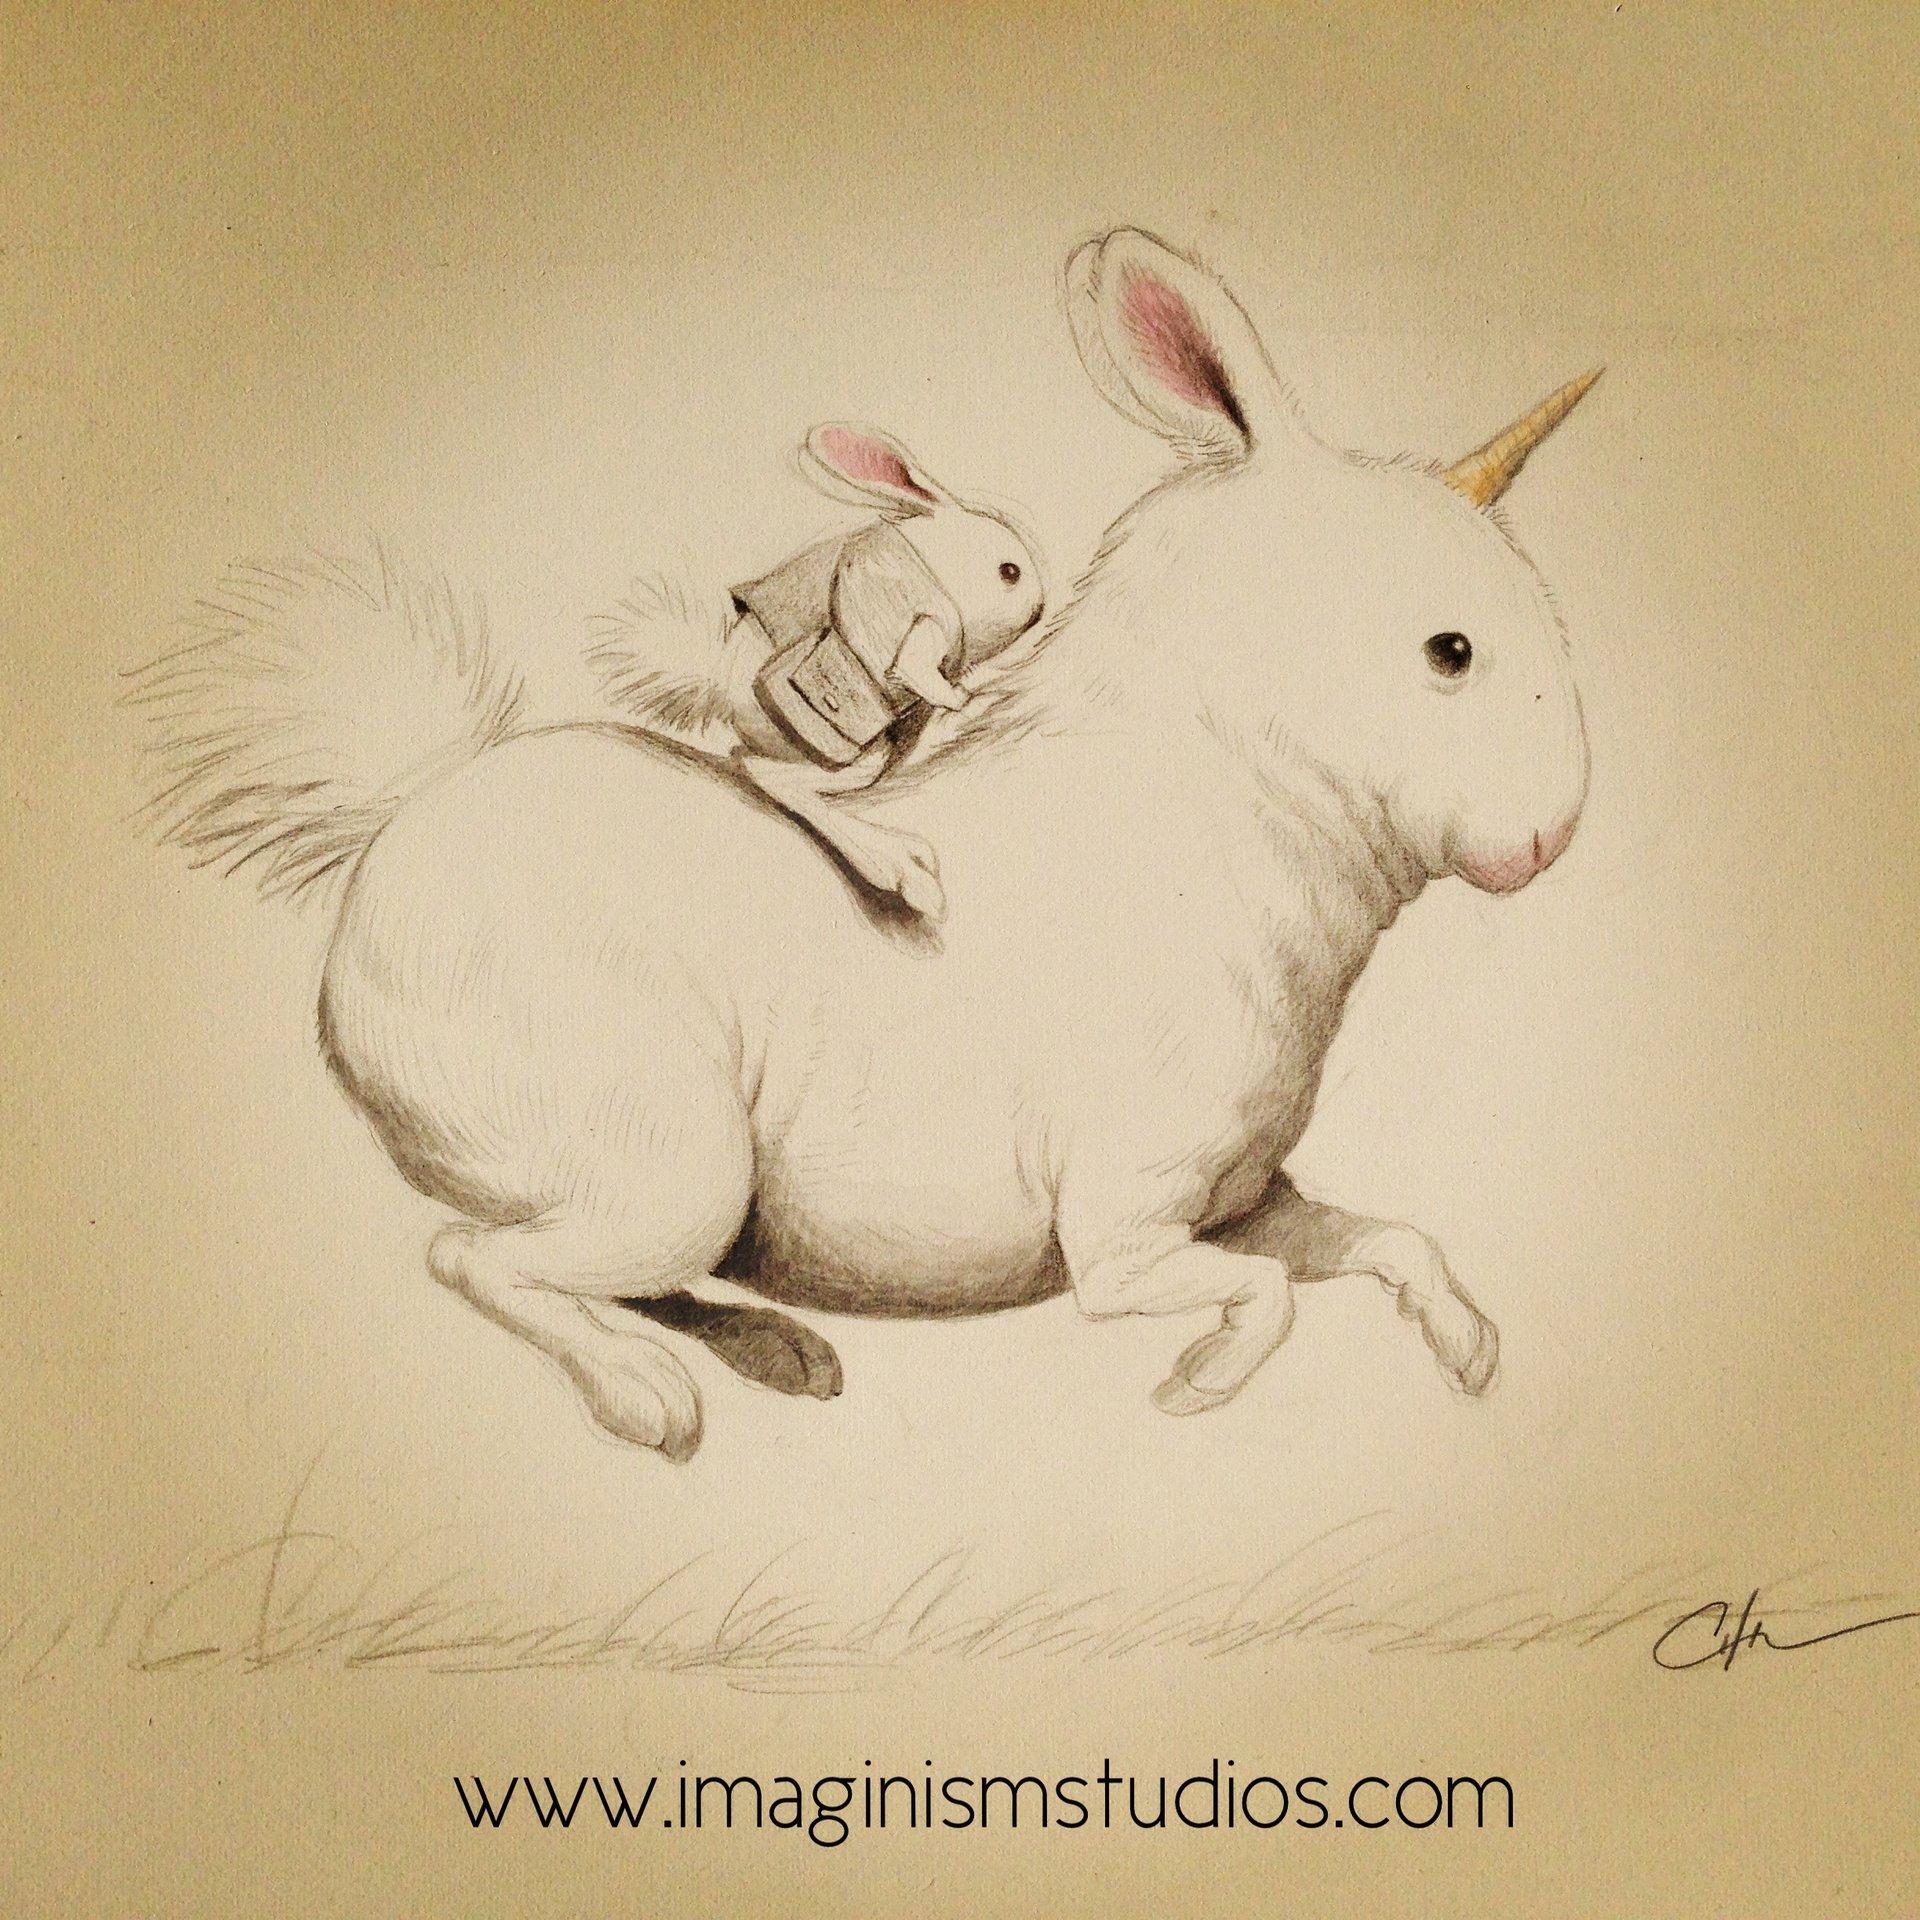 bobby-chiu-bunny-riding-bunny-unicorn-by-imaginism-d69fhrq.jpg